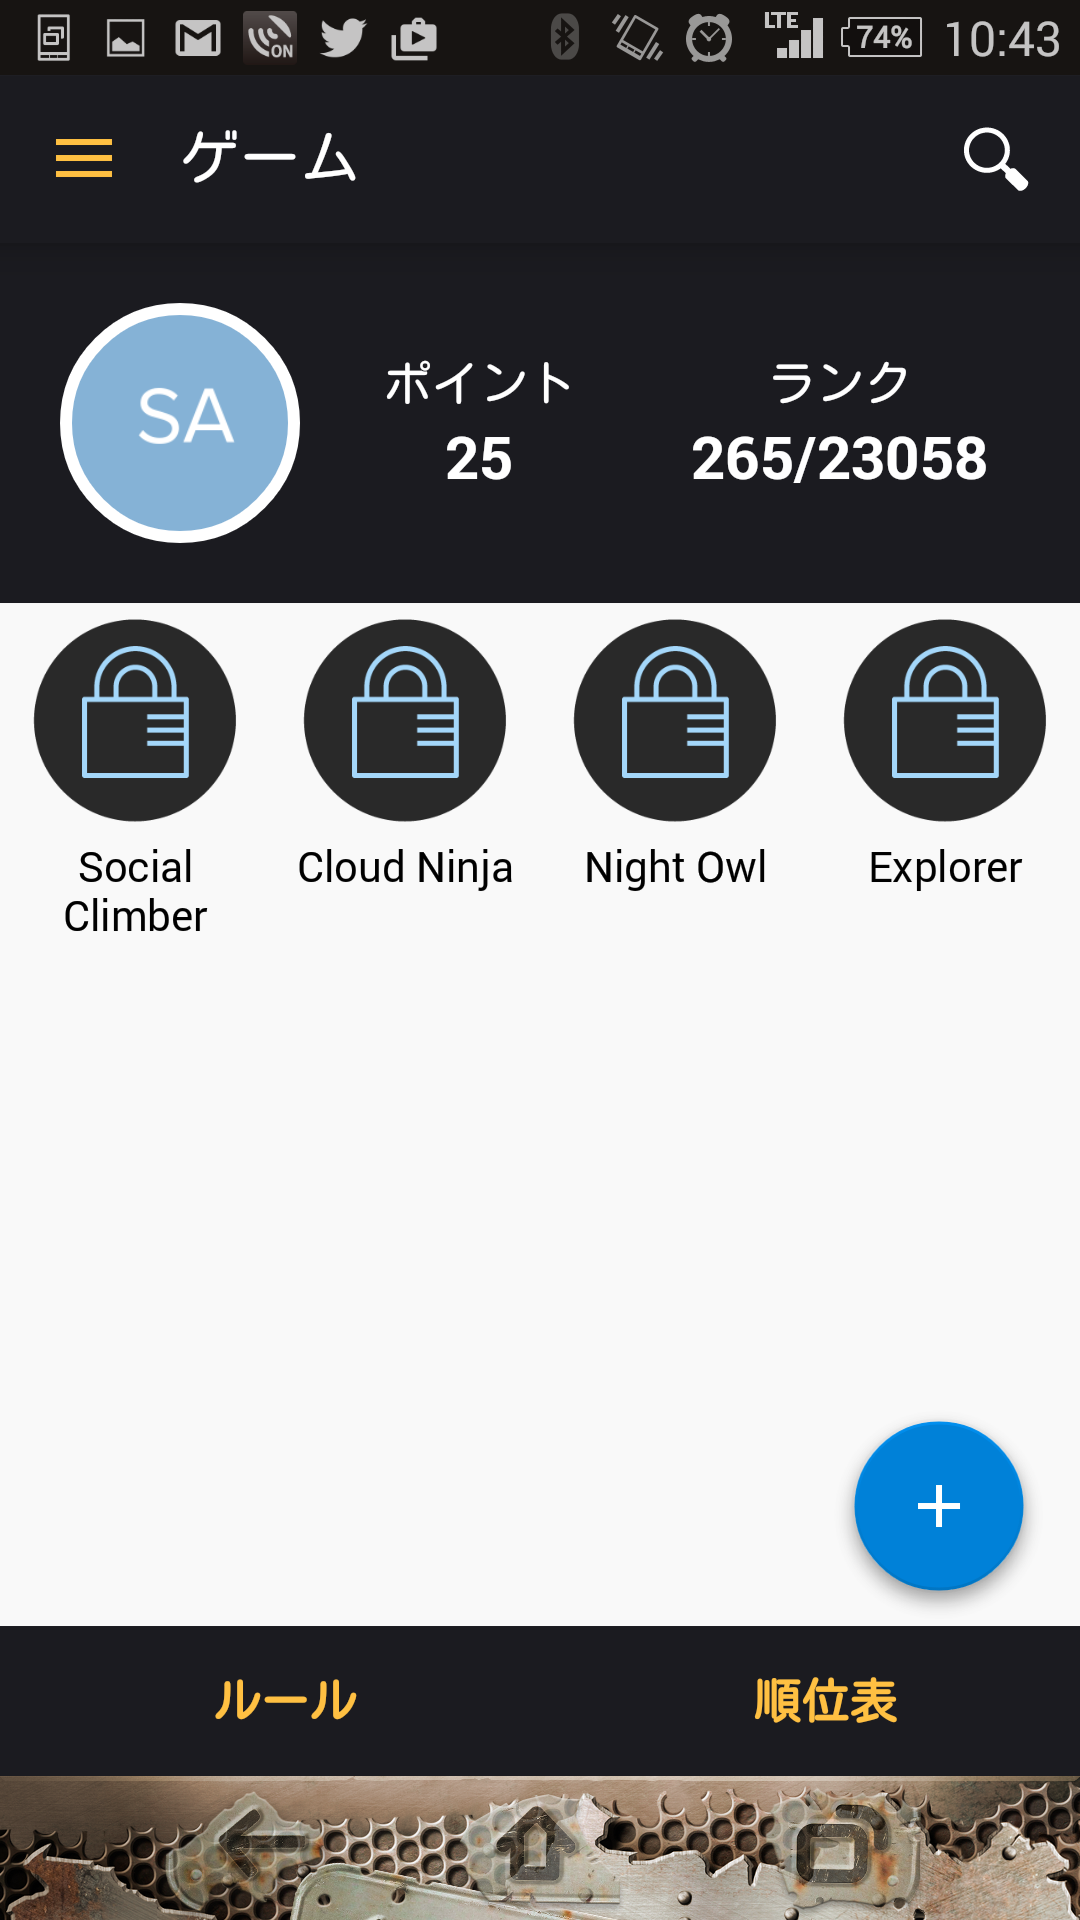 aws-reinvent-2015-event-app_16